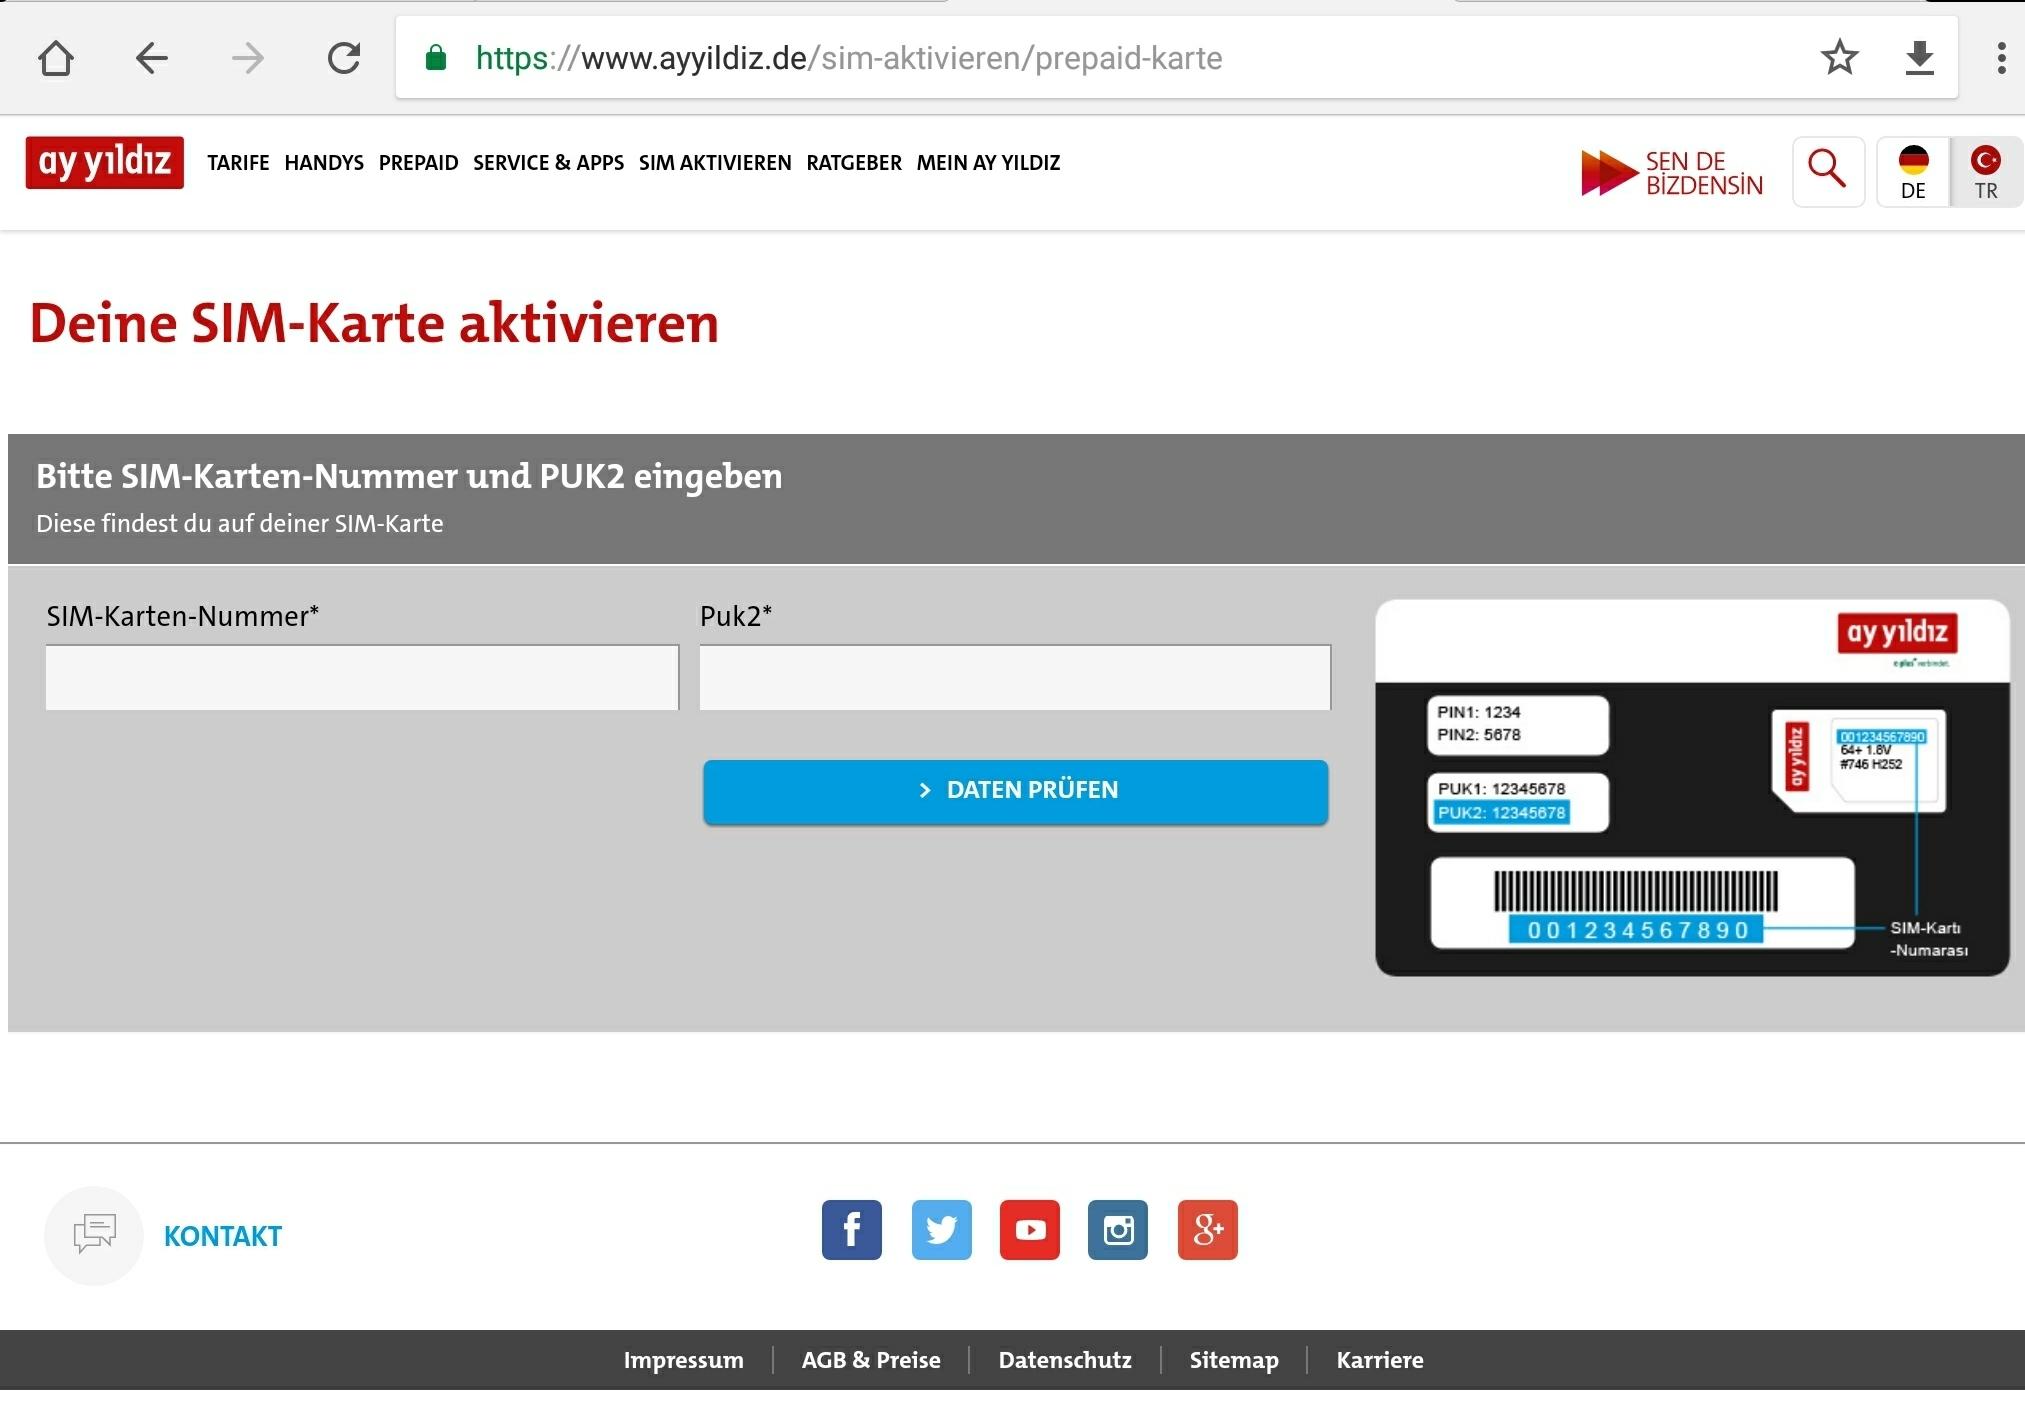 ay yildiz karte aktivieren Ay Yildiz: Kostenfreie Simkarte mit 10 Euro Startguthaben